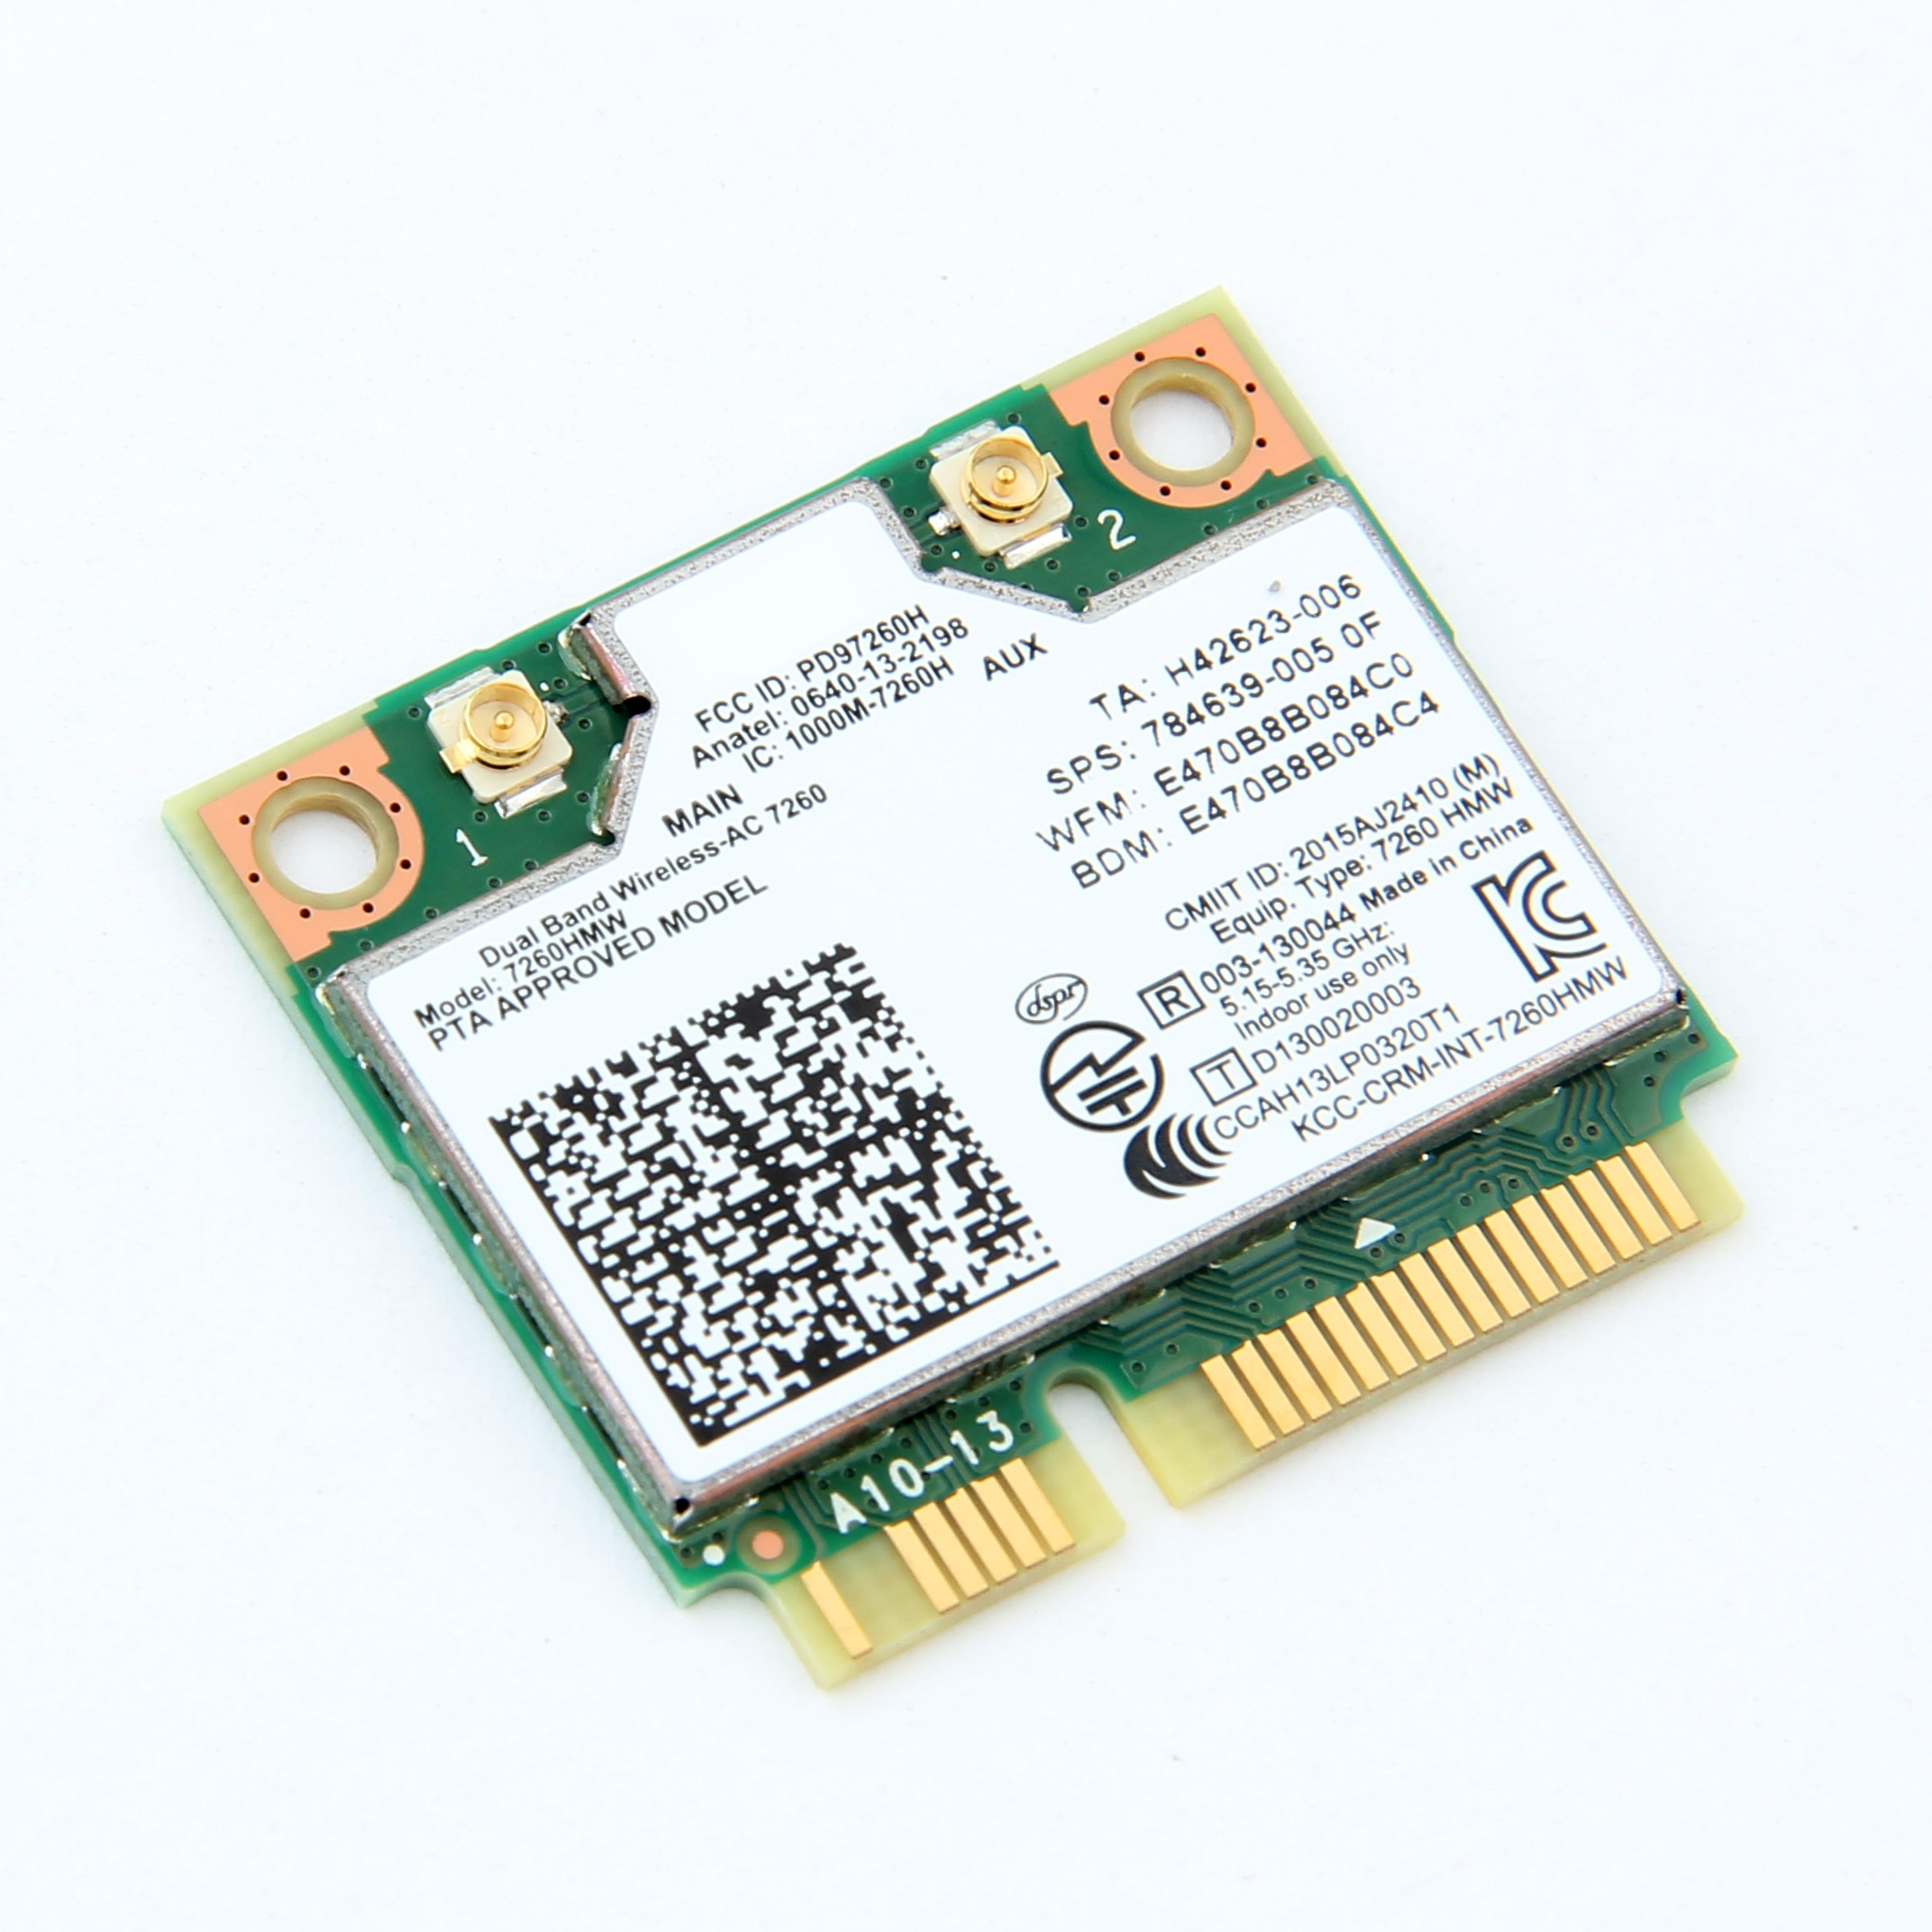 Intel 7260 AC tarjeta Wifi inalámbrica 7260HMW media Mini PCI-E 2,4G/5Ghz Bluetooth 4,0 adaptador 802.11ac IPEX antenas portátil 10 Uds.